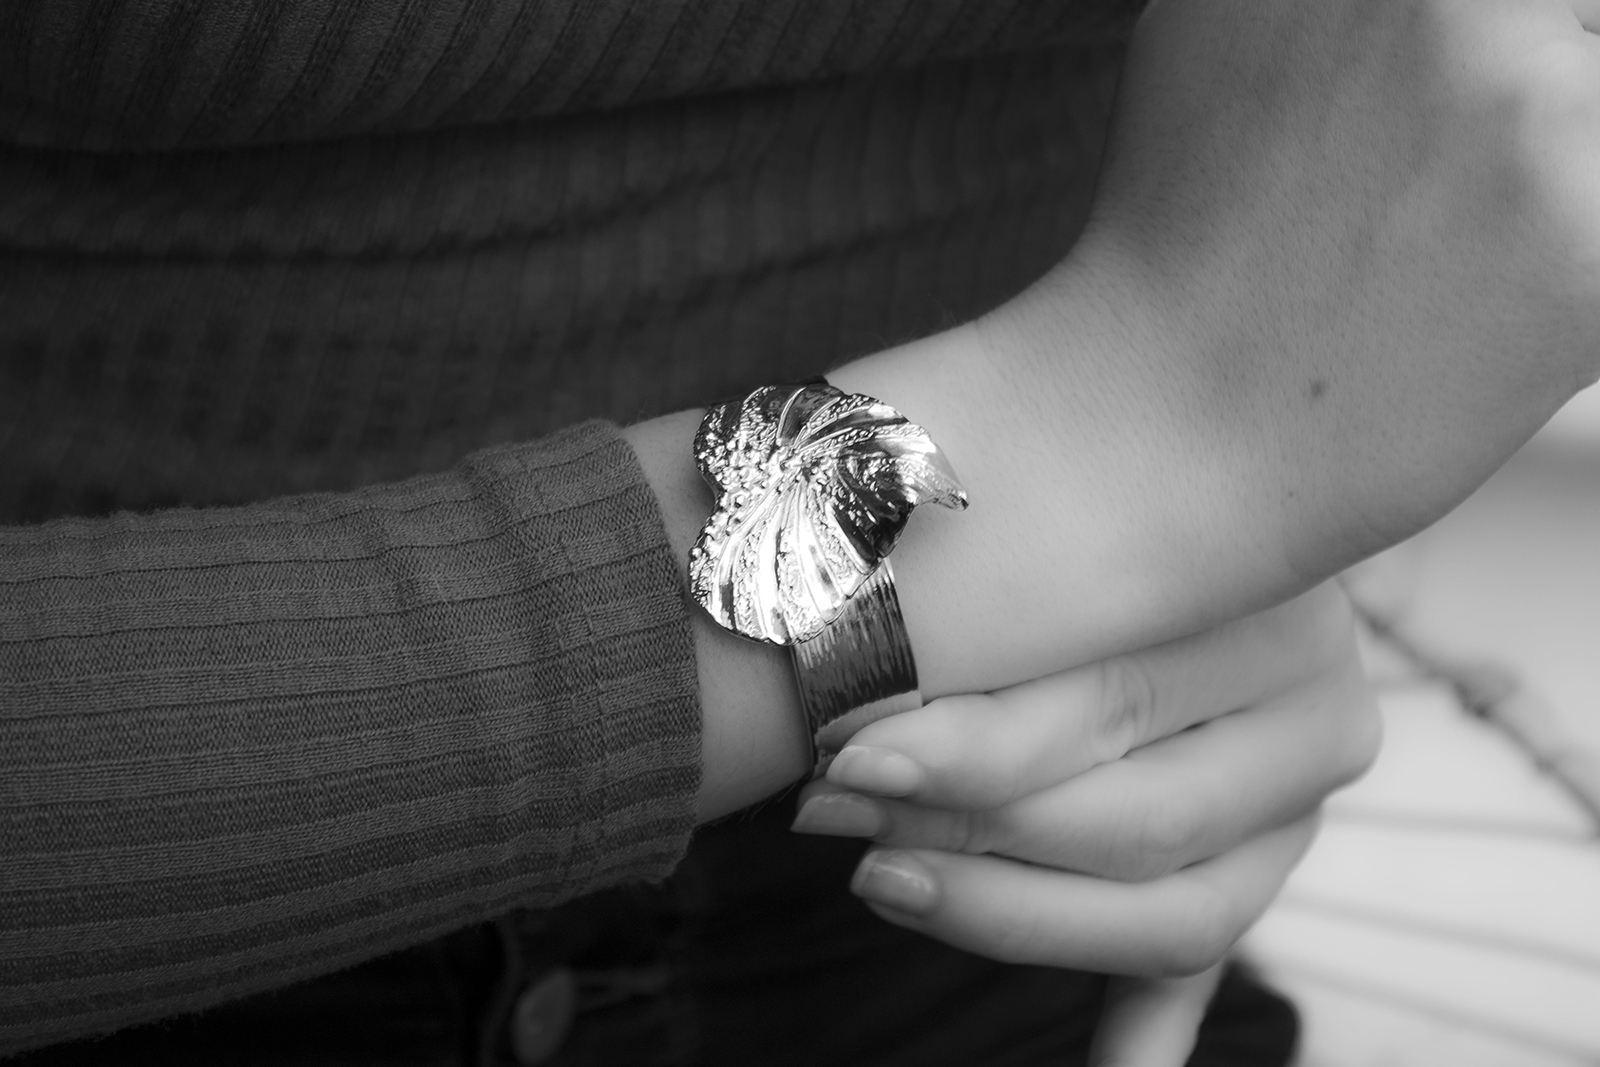 Celine-lareynie-bijoux-fantaisie-bracelet-ajustable-en-forme-de-